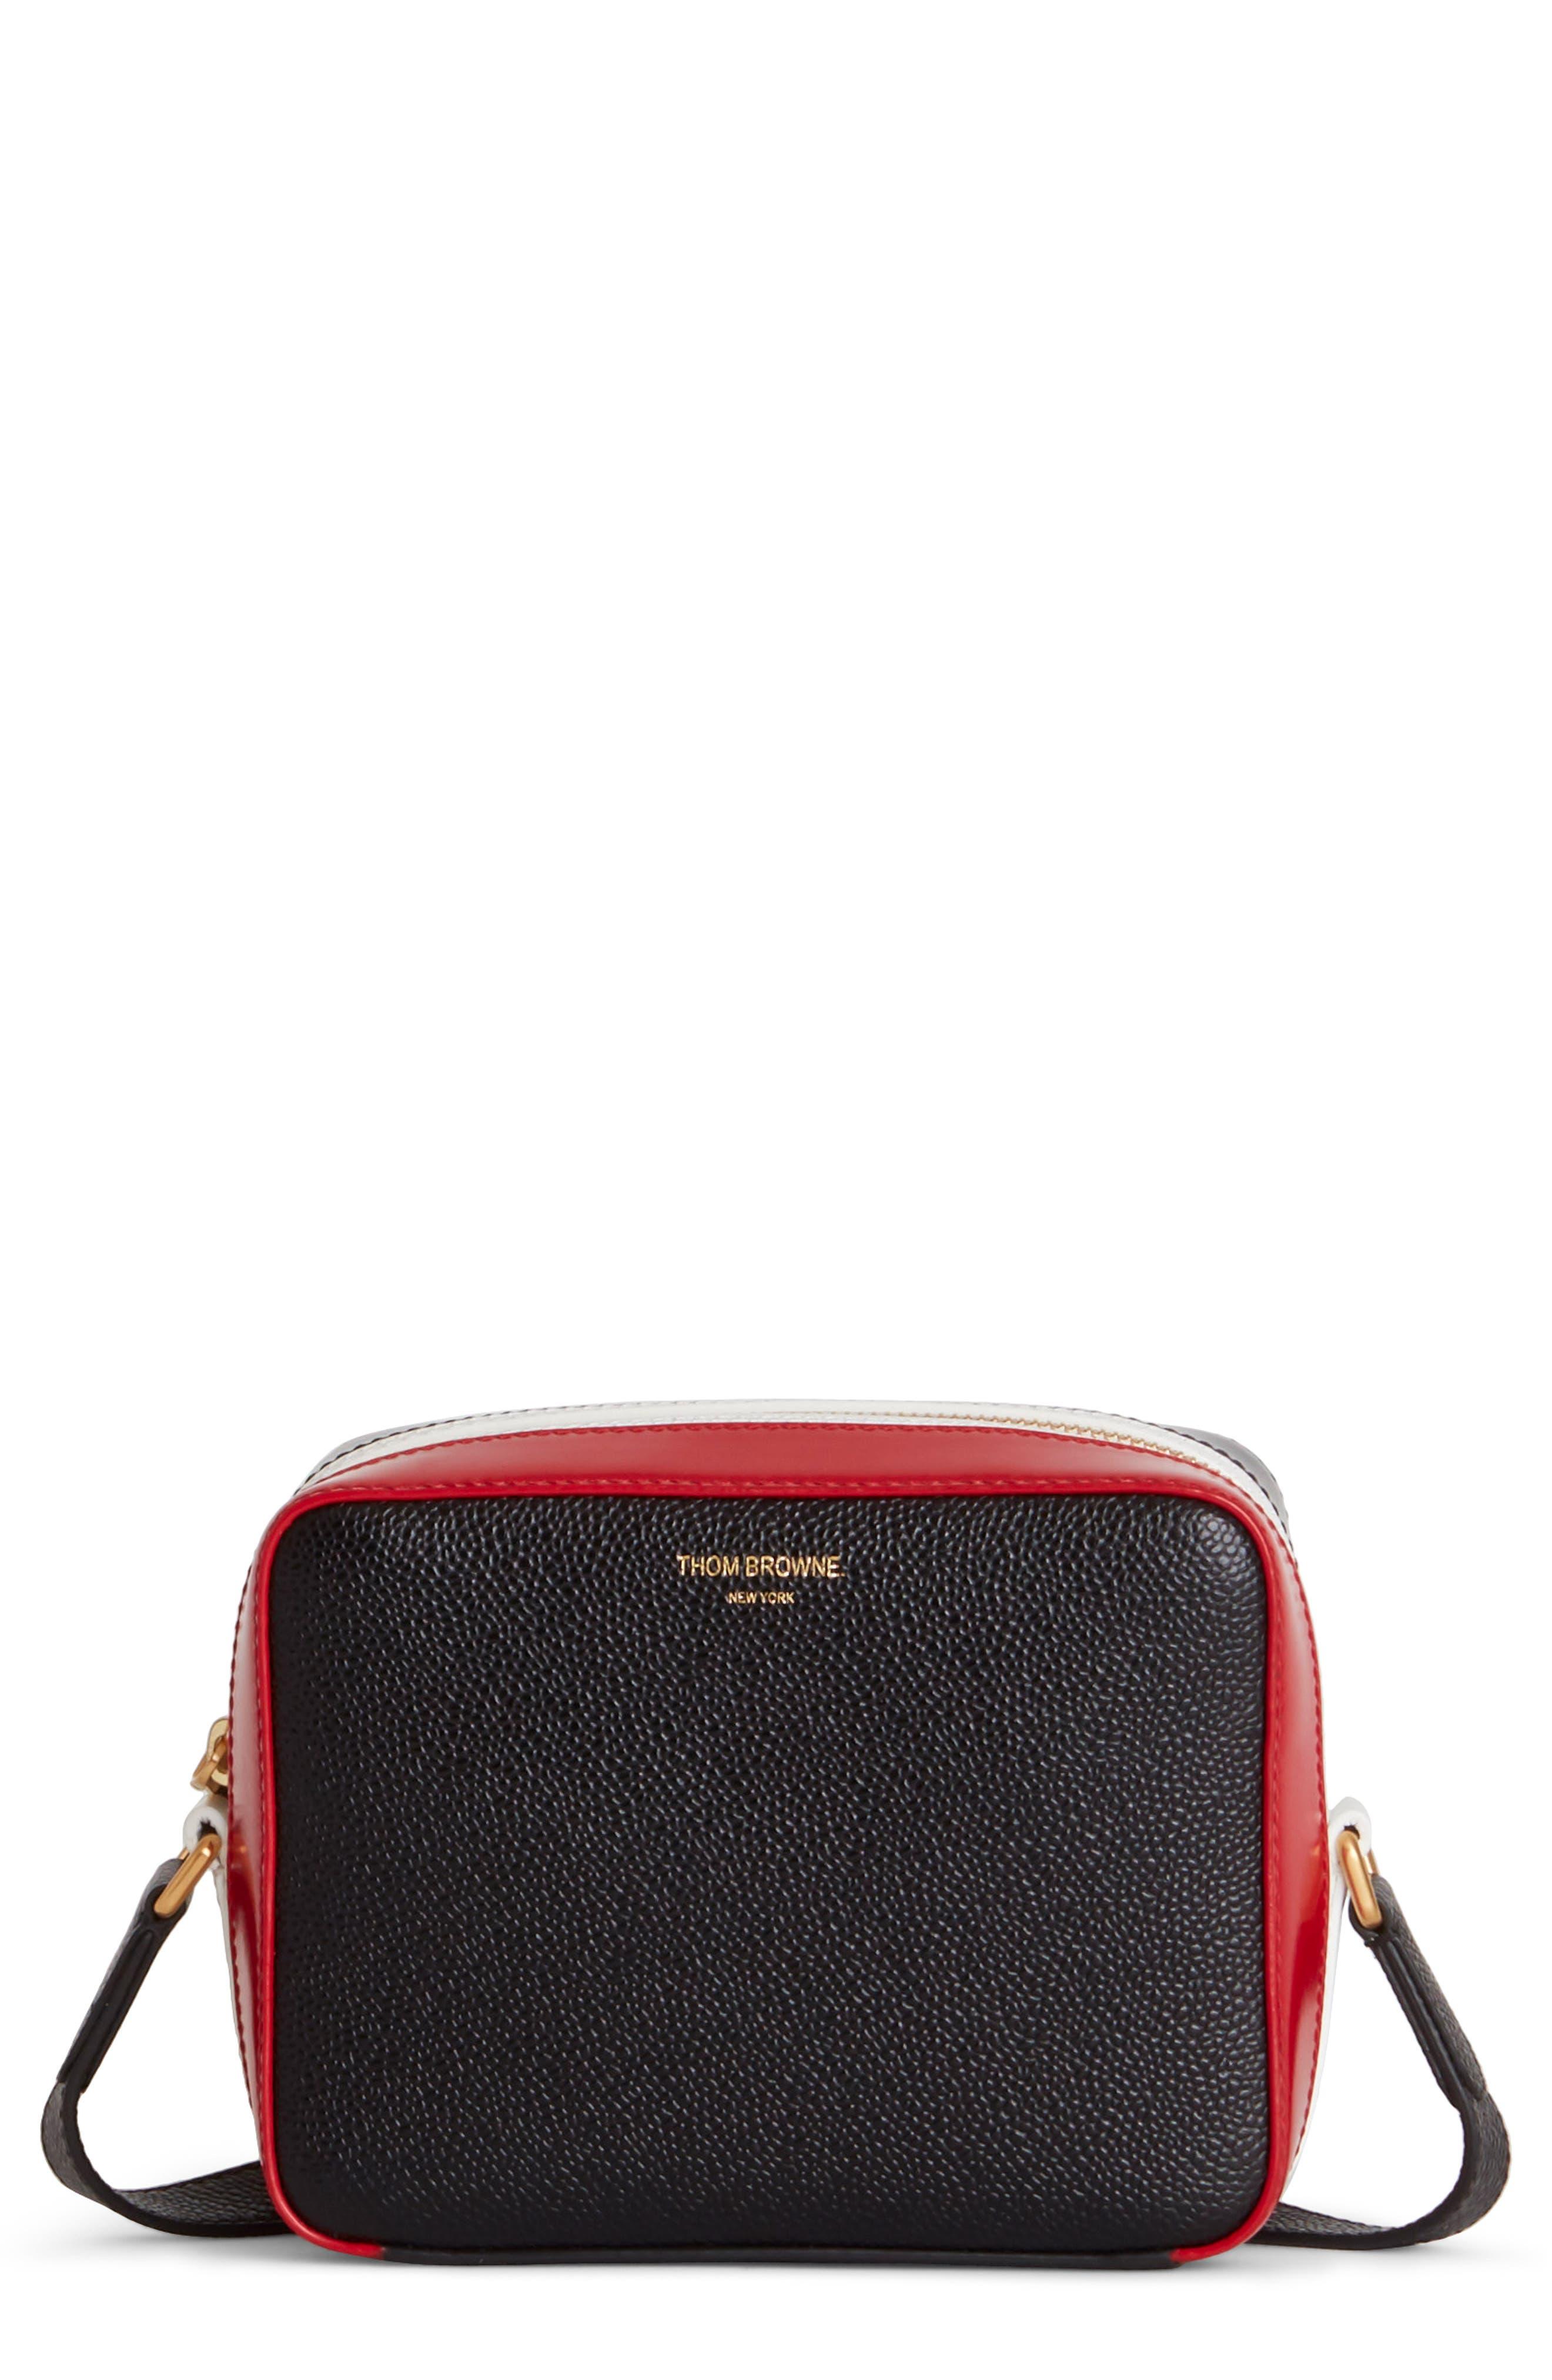 Mini Business Leather Camera Bag - Black